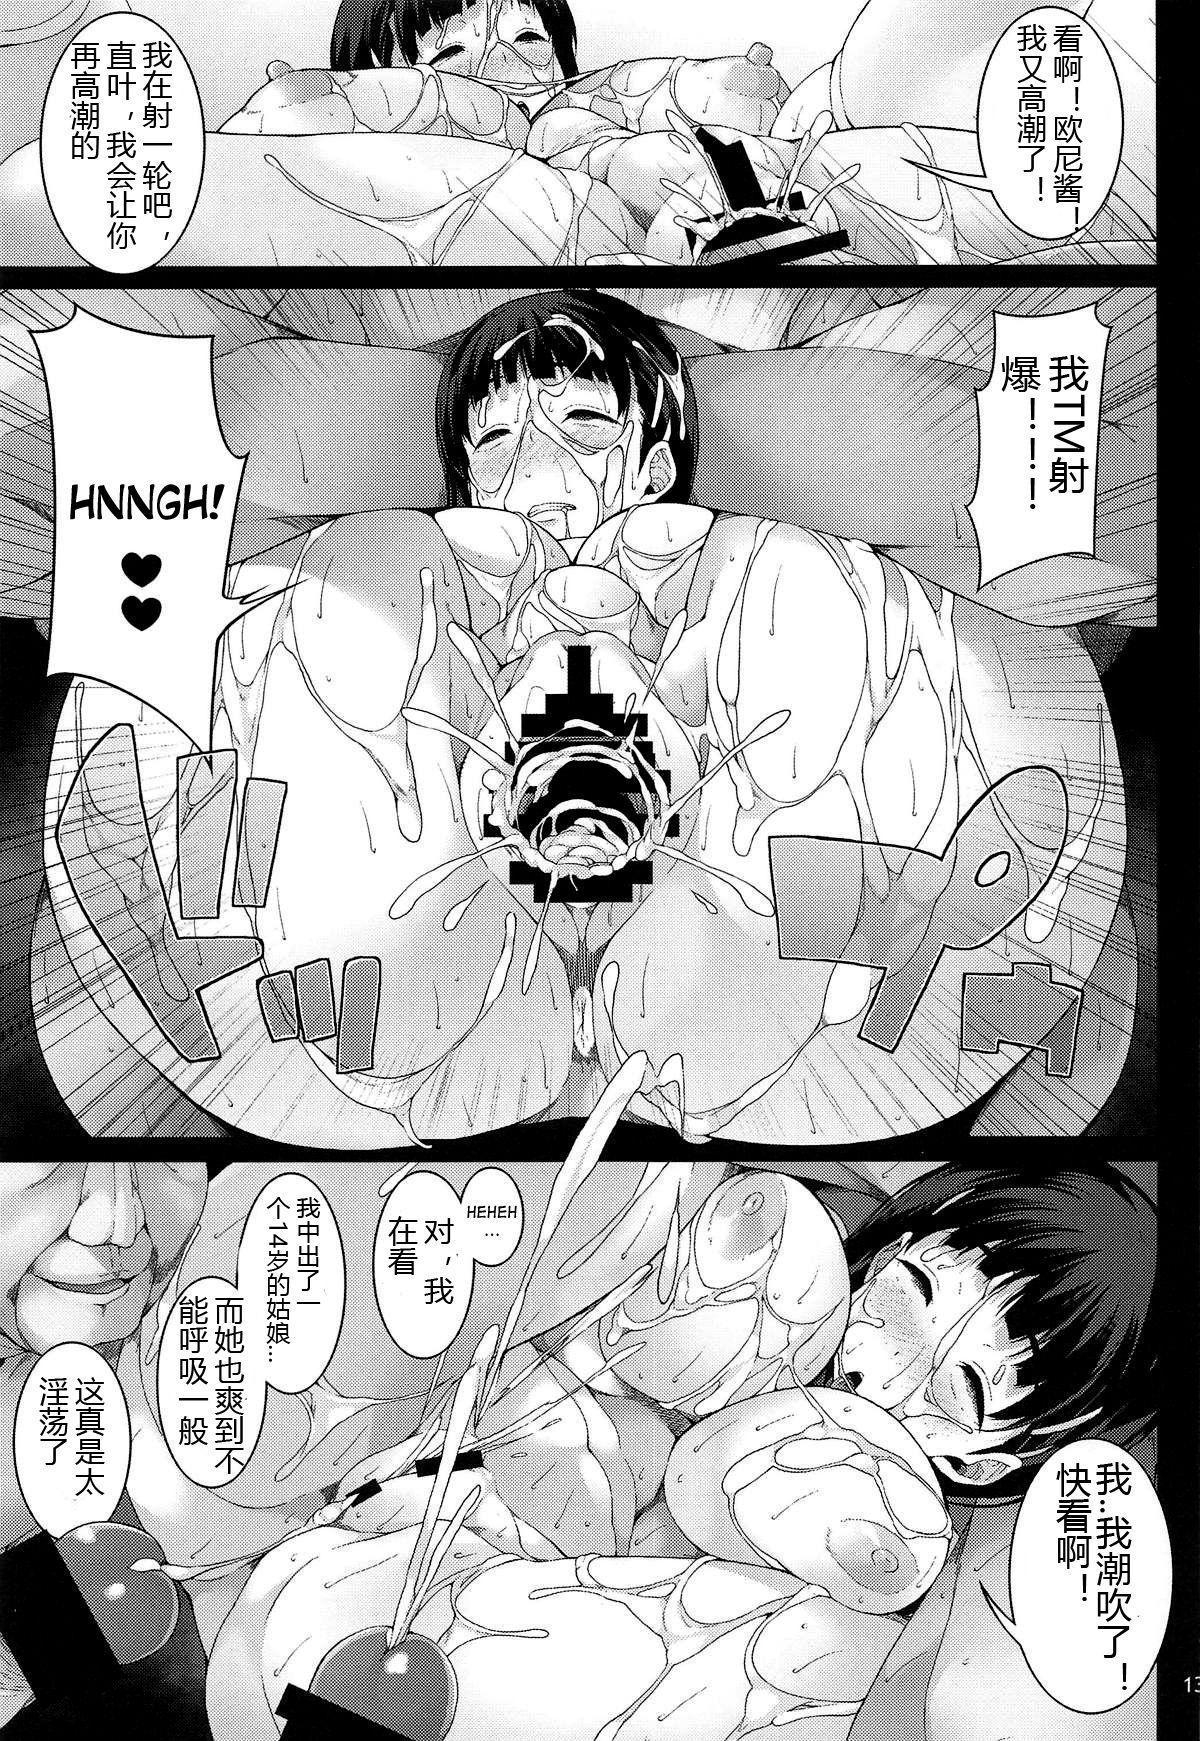 Suguha-chan Seiiku Shidou 14